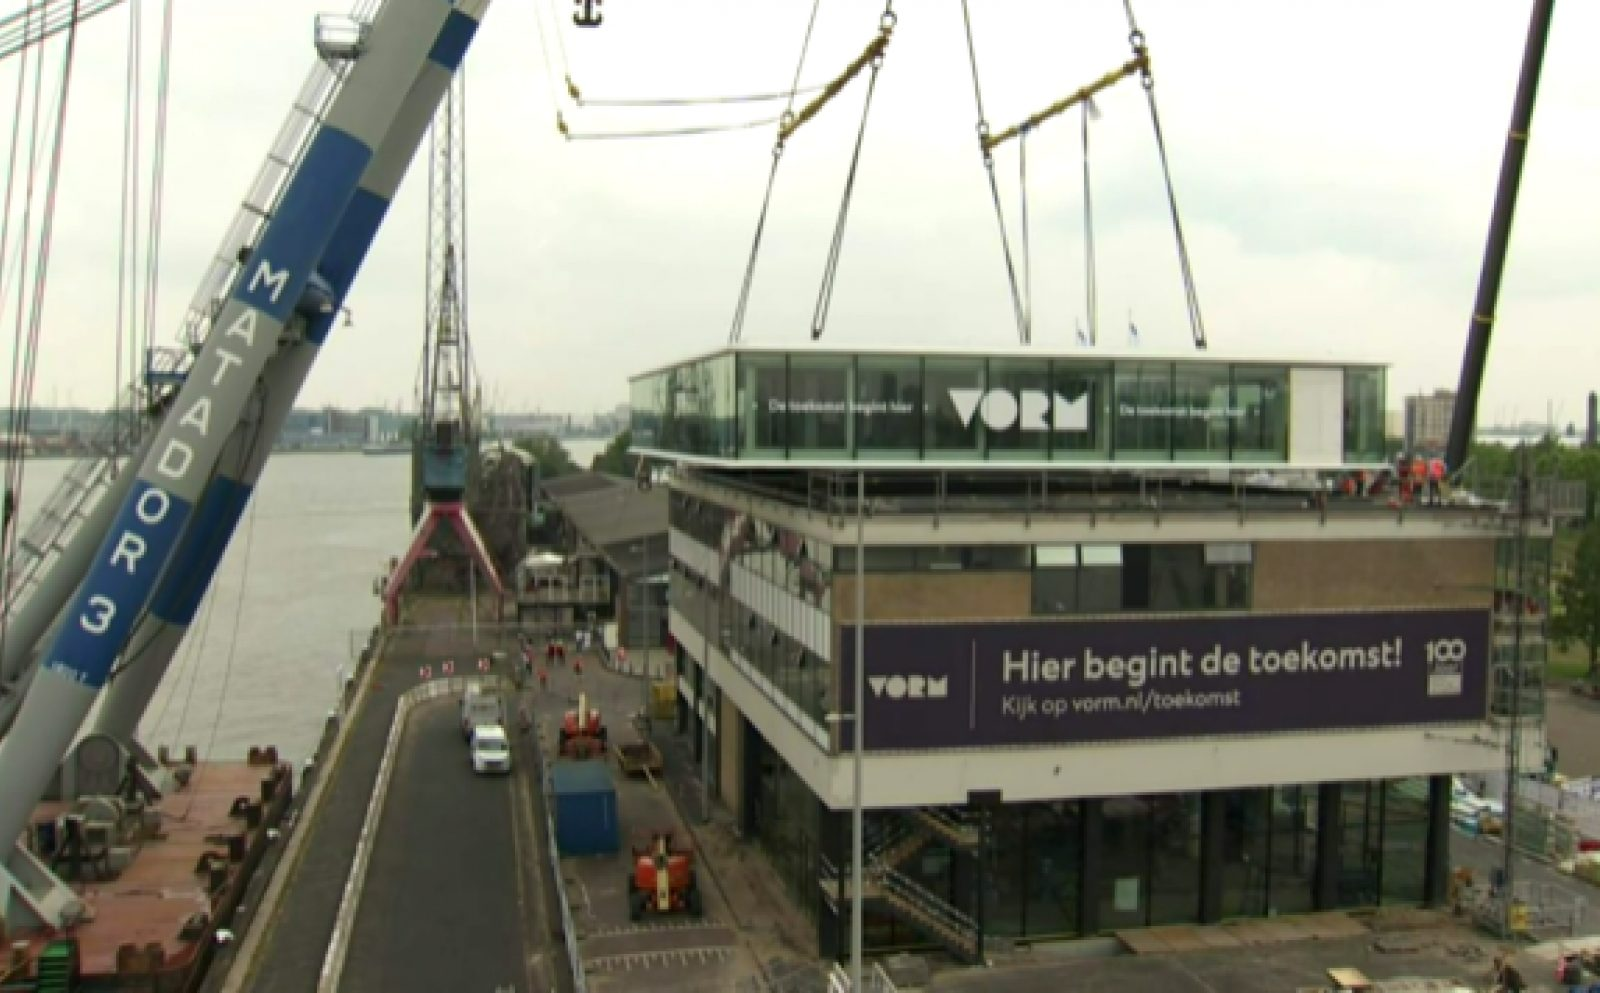 20200616 Plaatsing etage op Poortgebouw Vorm